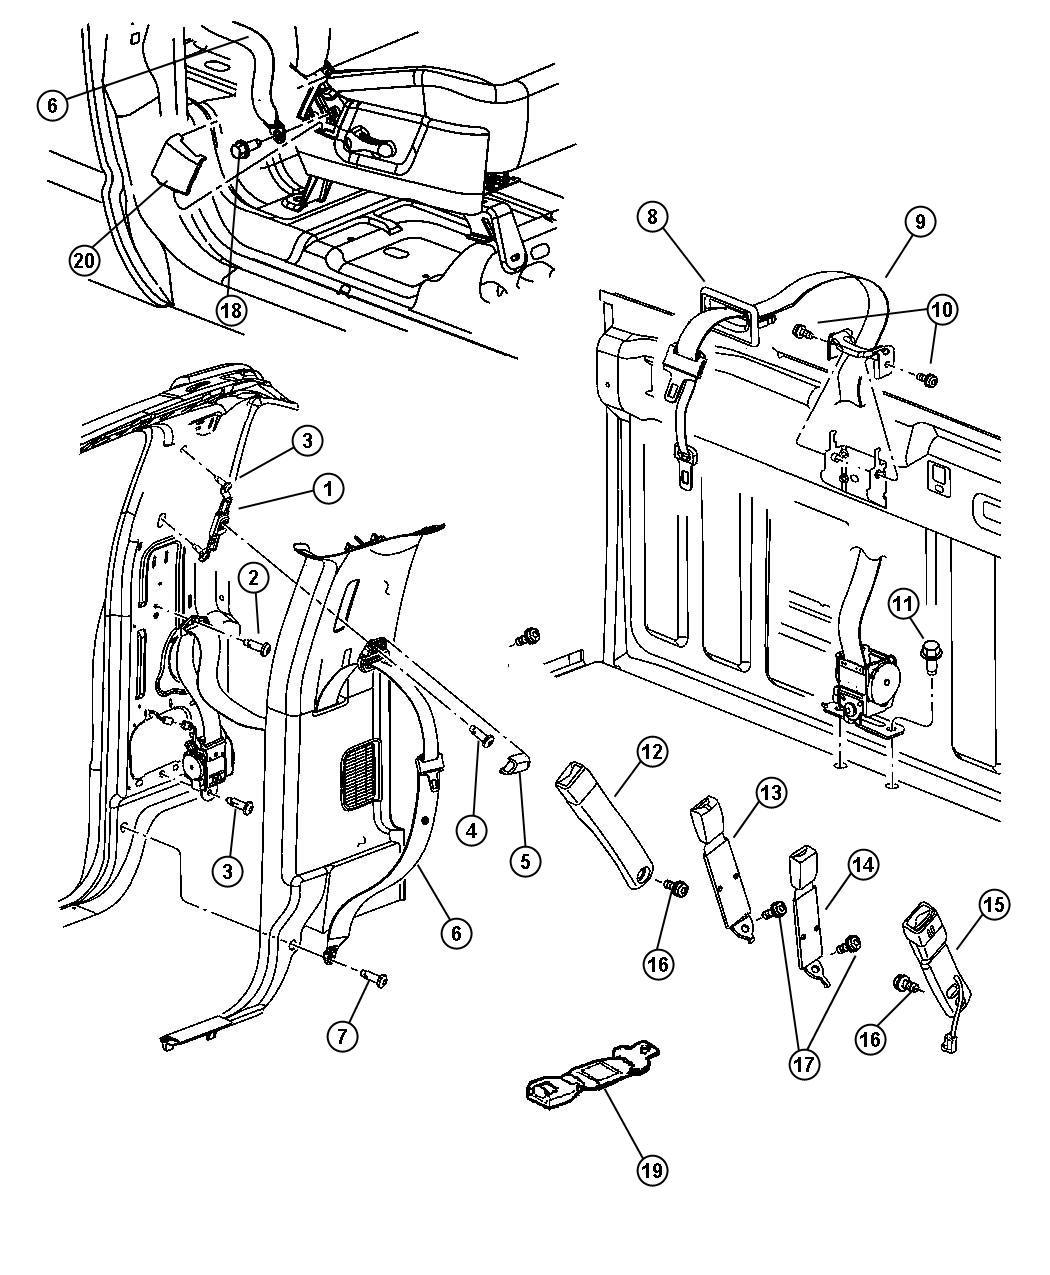 Dodge Ram Bezel Seat Belt D5 Trim All Trim